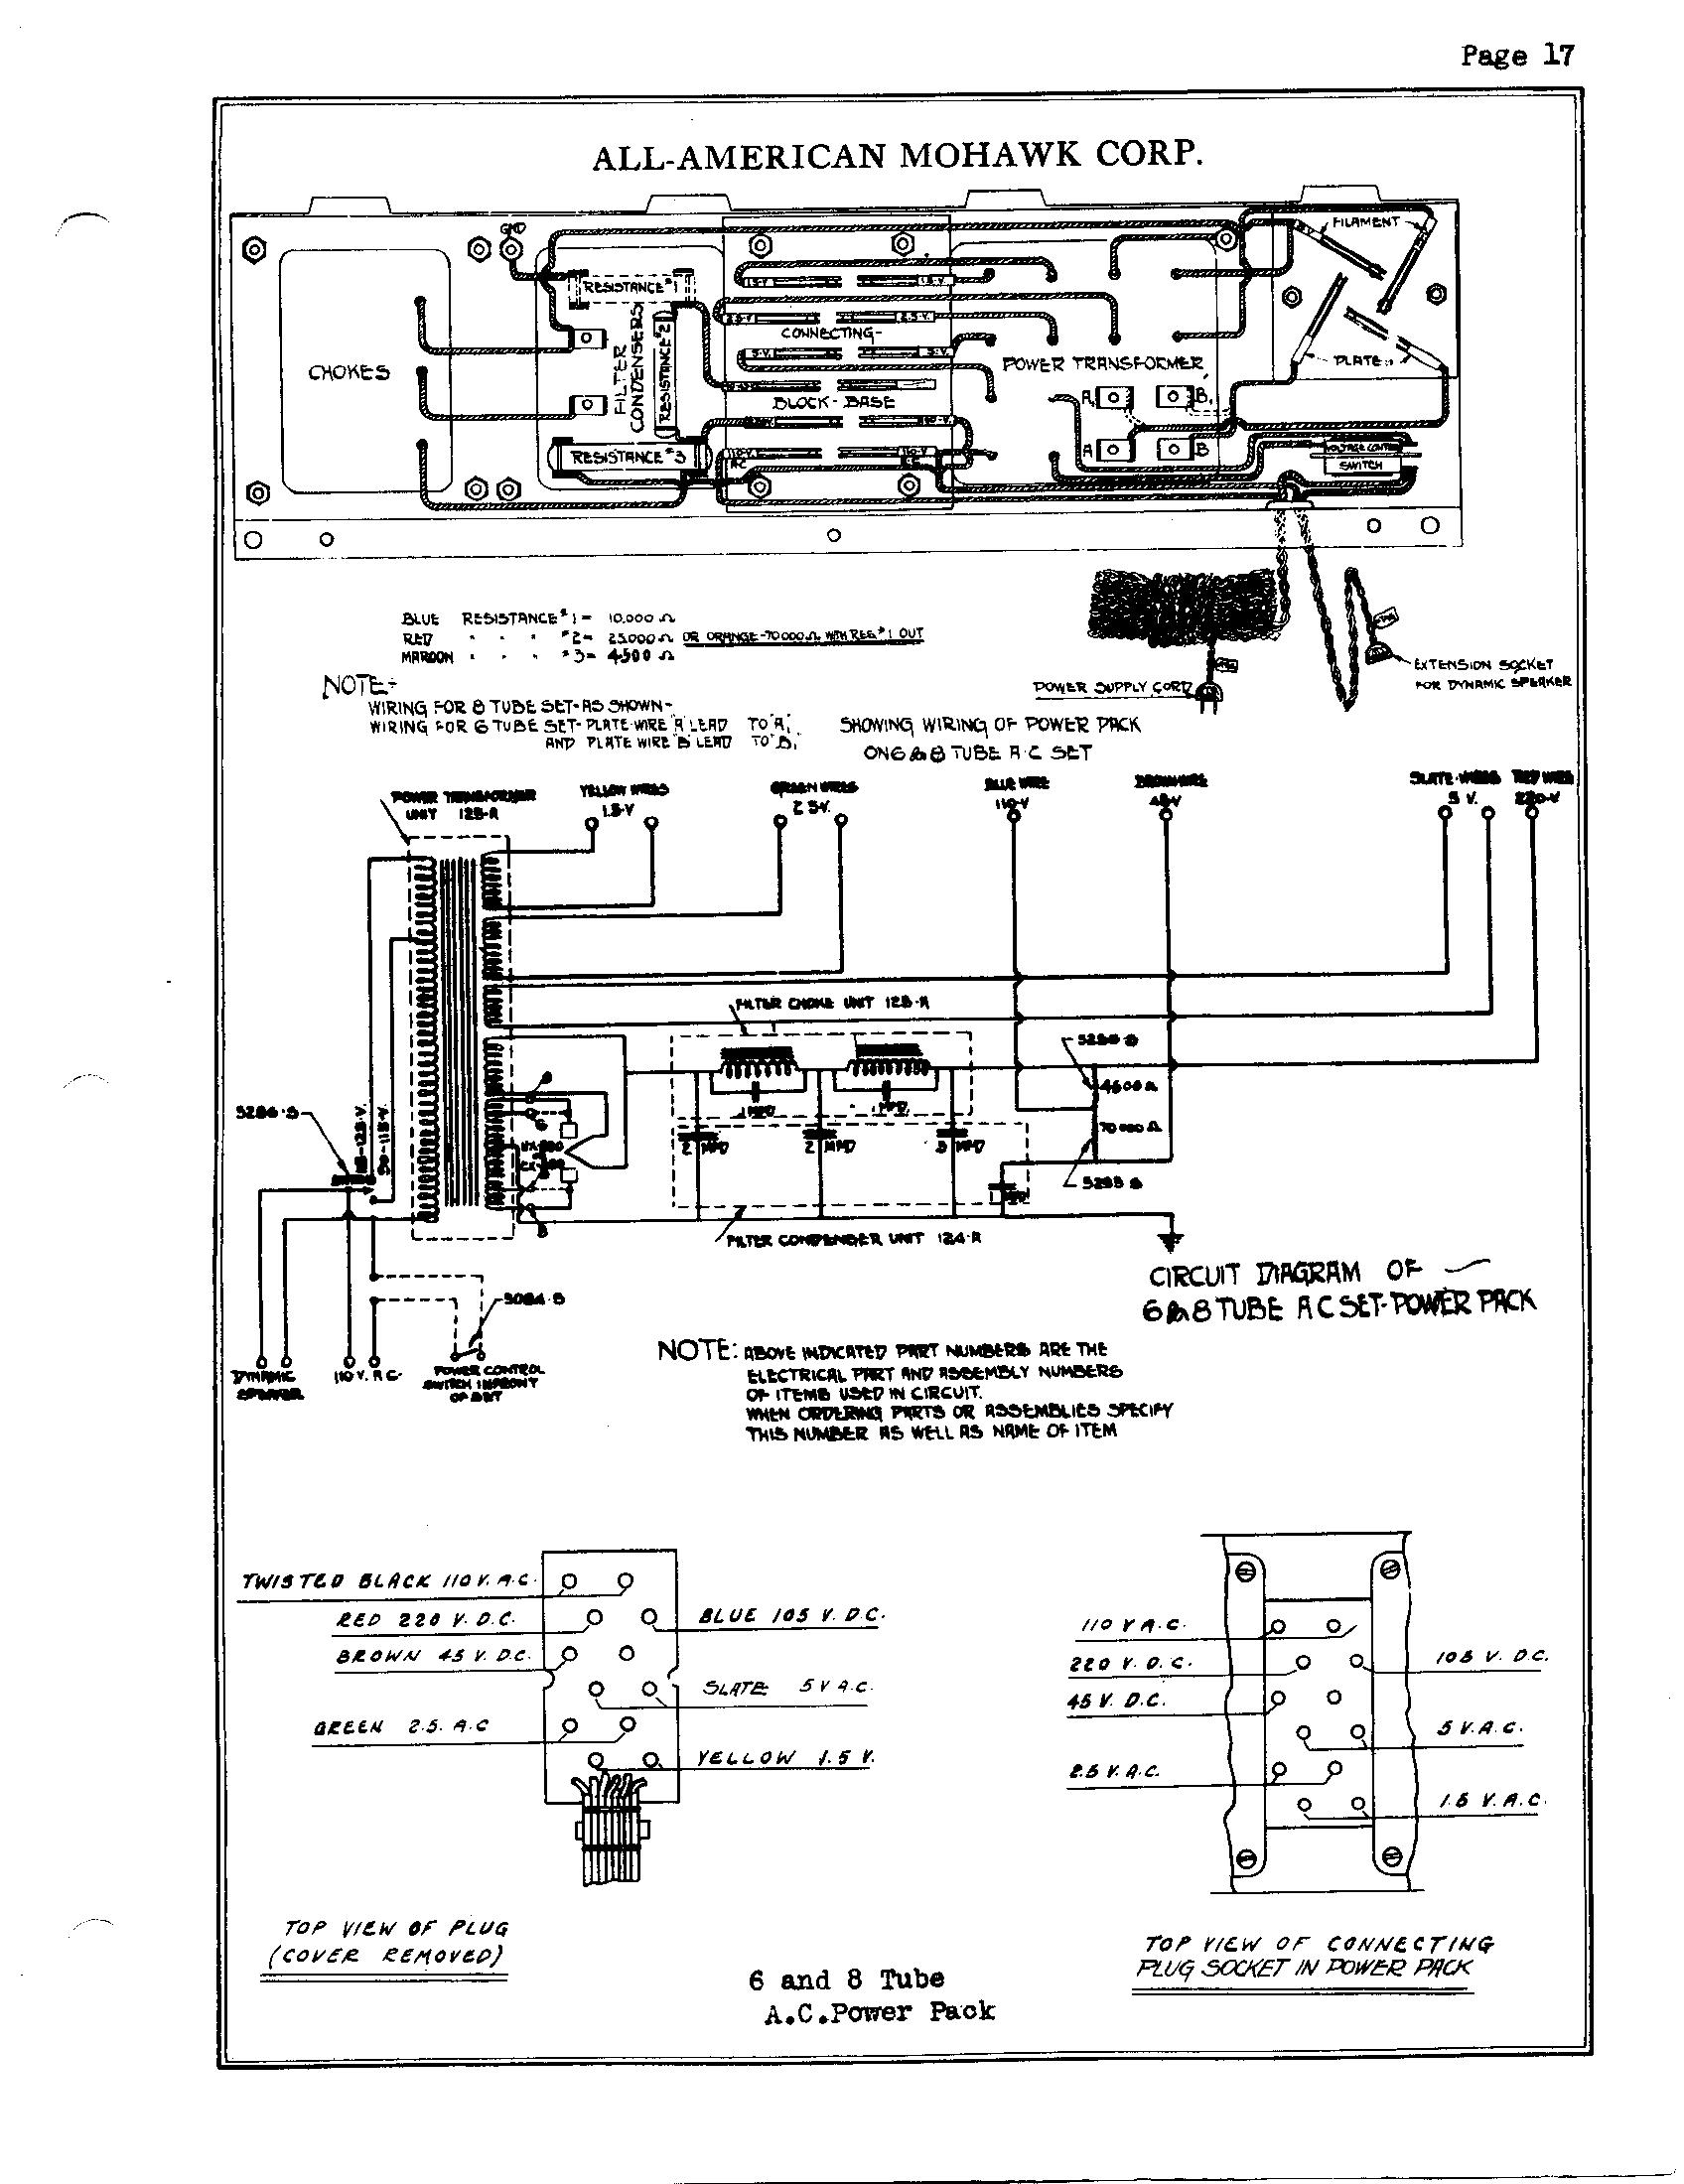 Ac Dot2800 Red Diagram 0 Wiring on